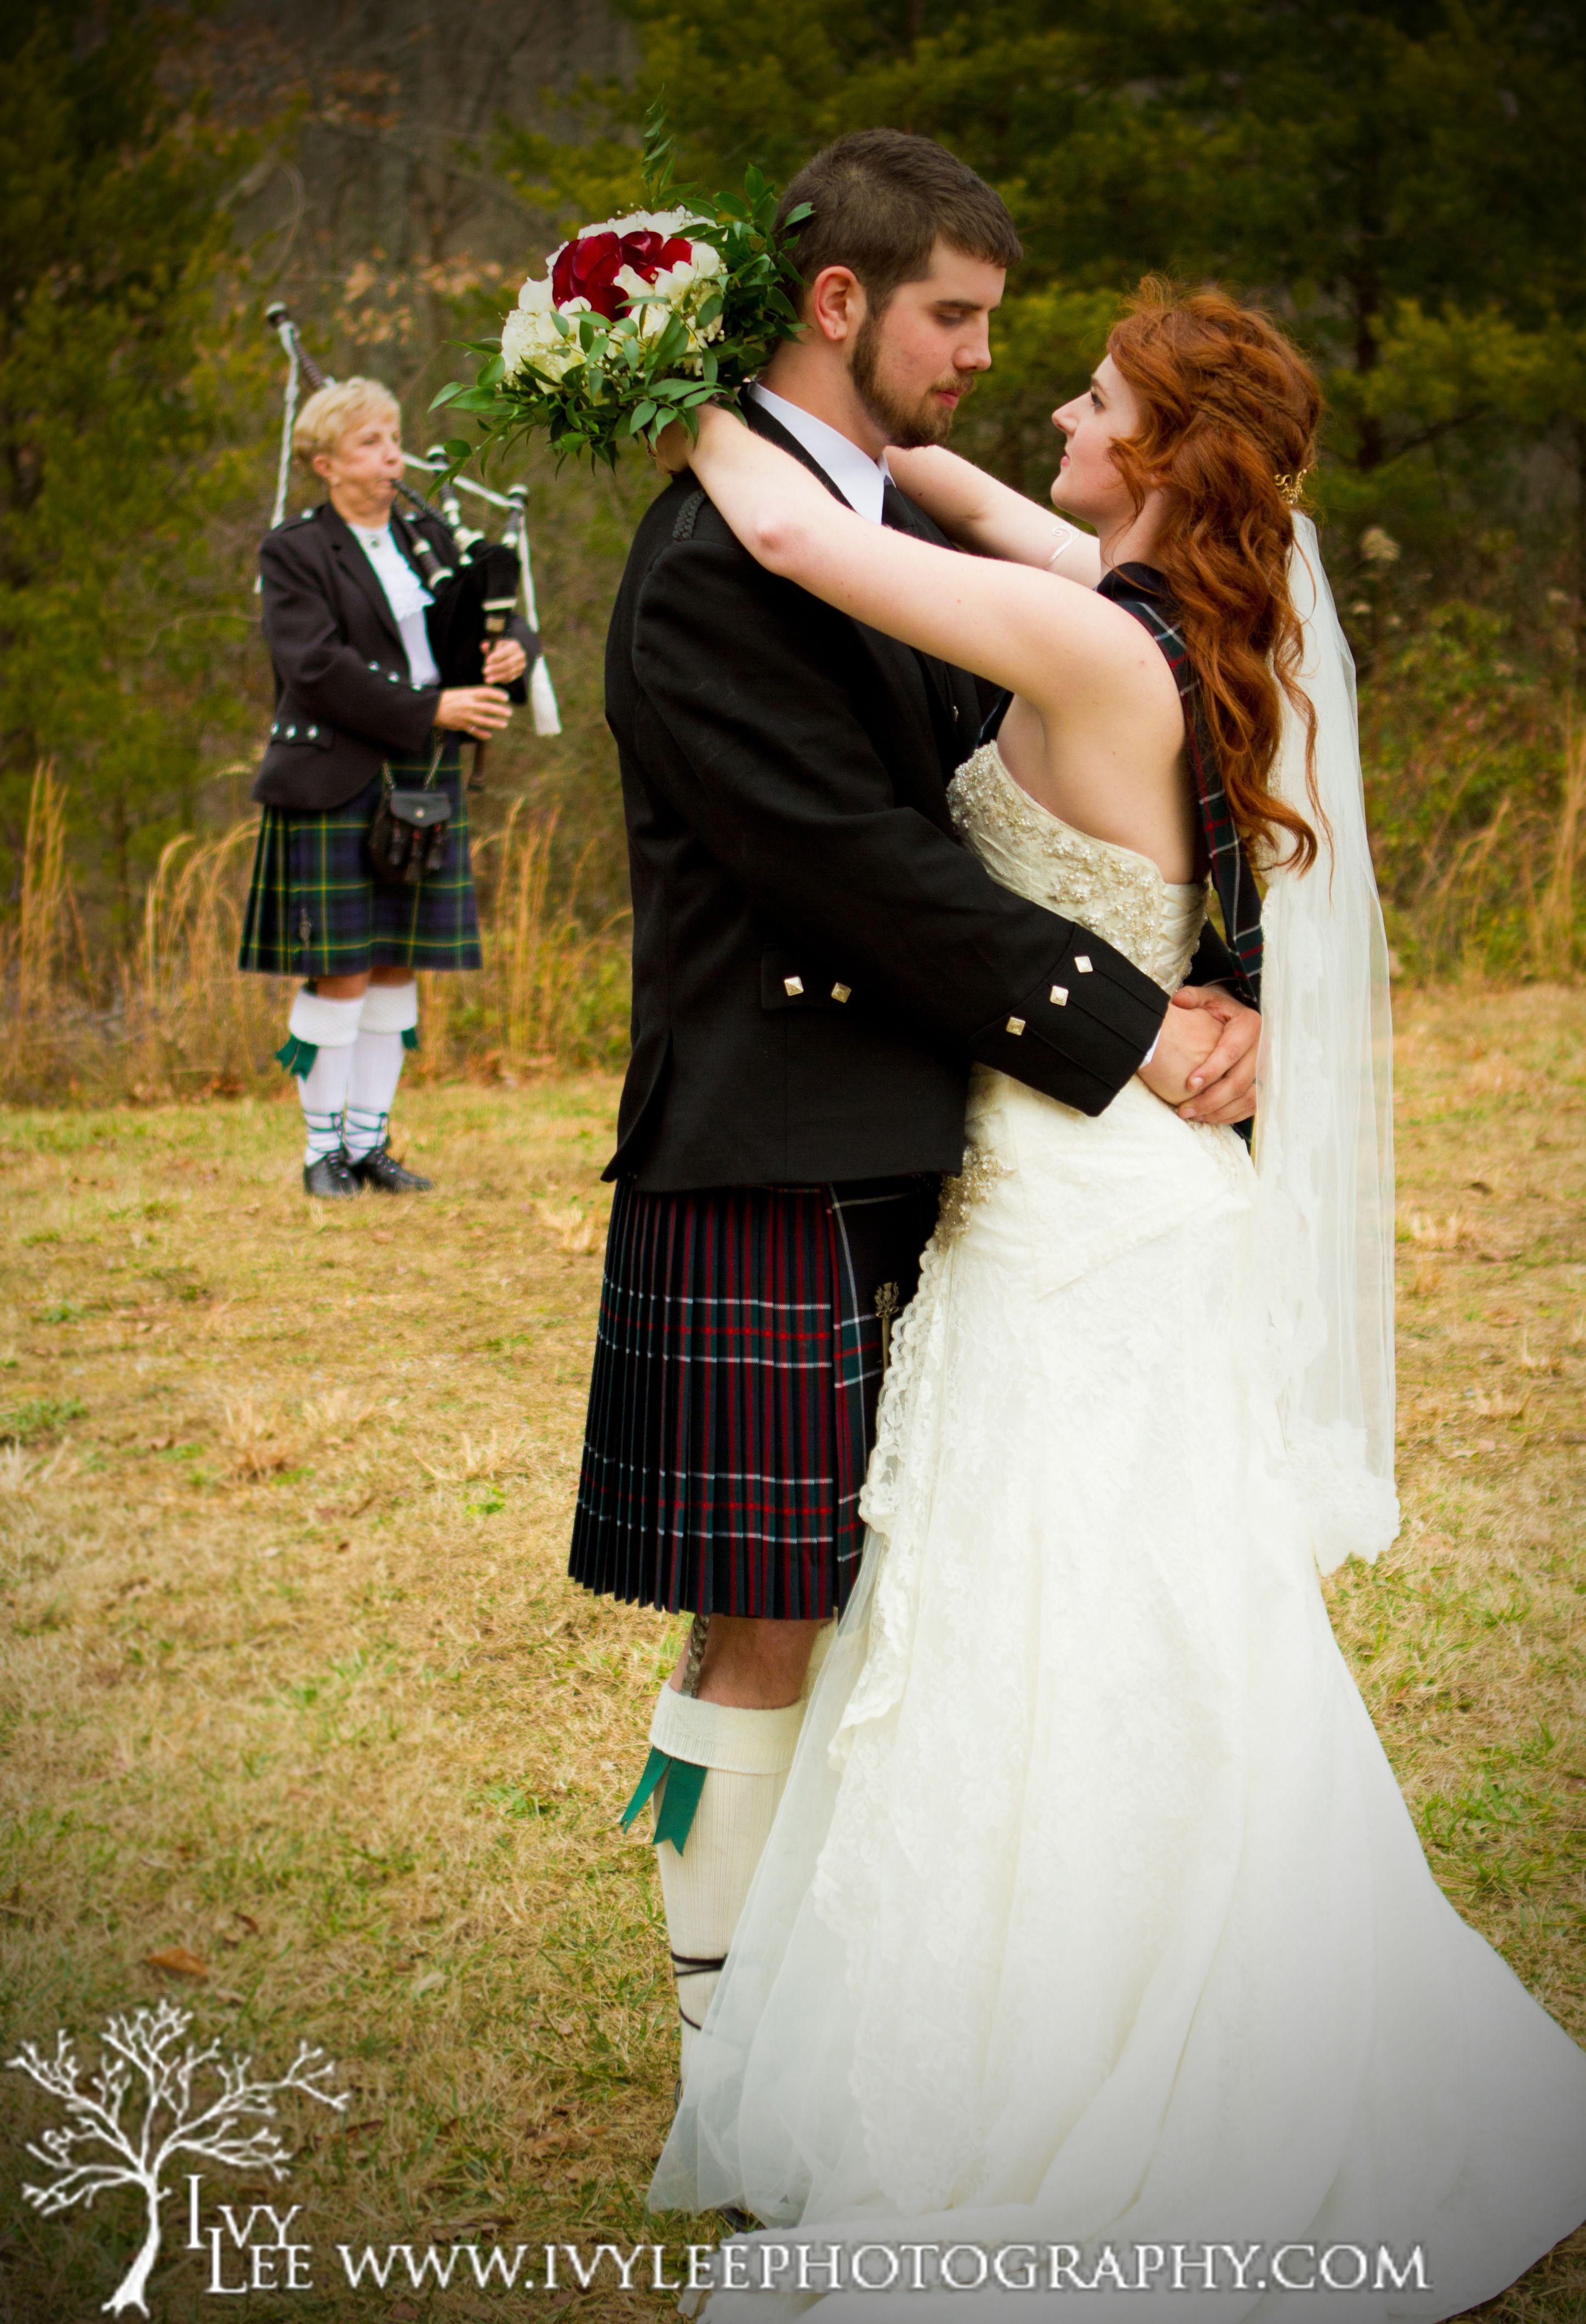 Irish Wedding Traditions.Irish Wedding By Ivy Lee Photography Celtic Festival Wedding